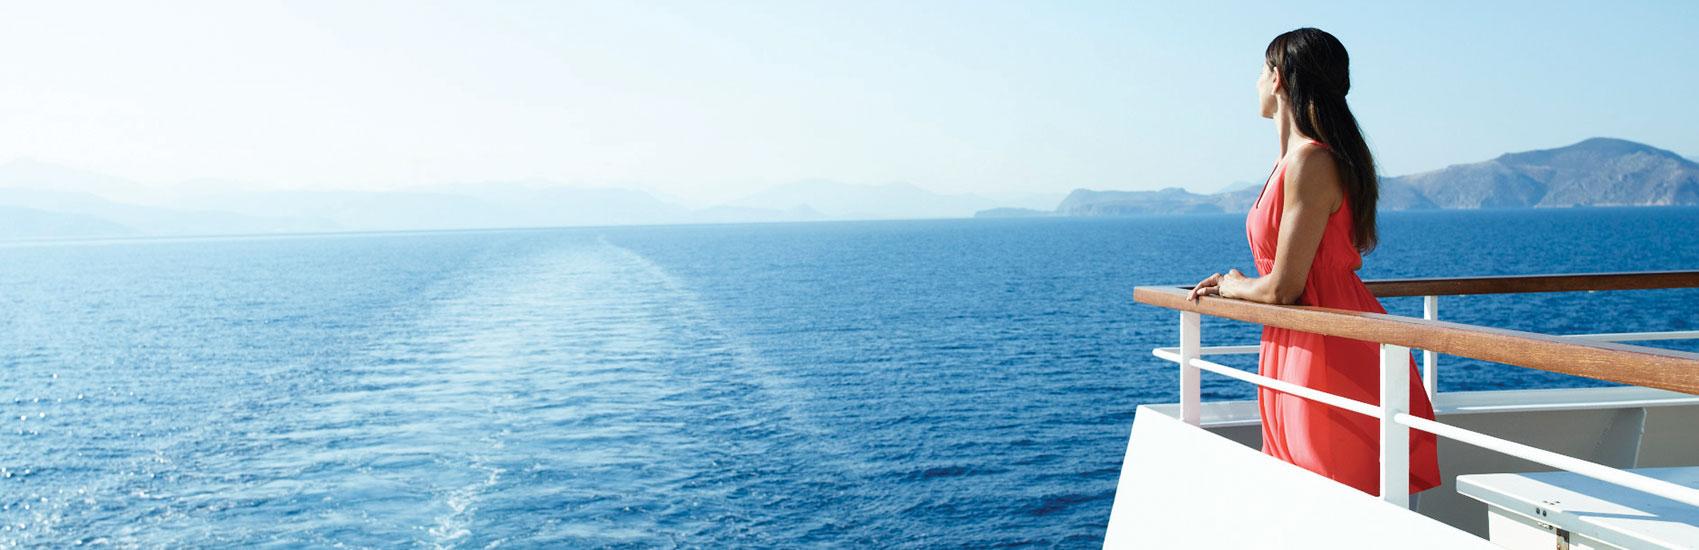 Sail Solo with Seabourn's Sensational Savings! 0